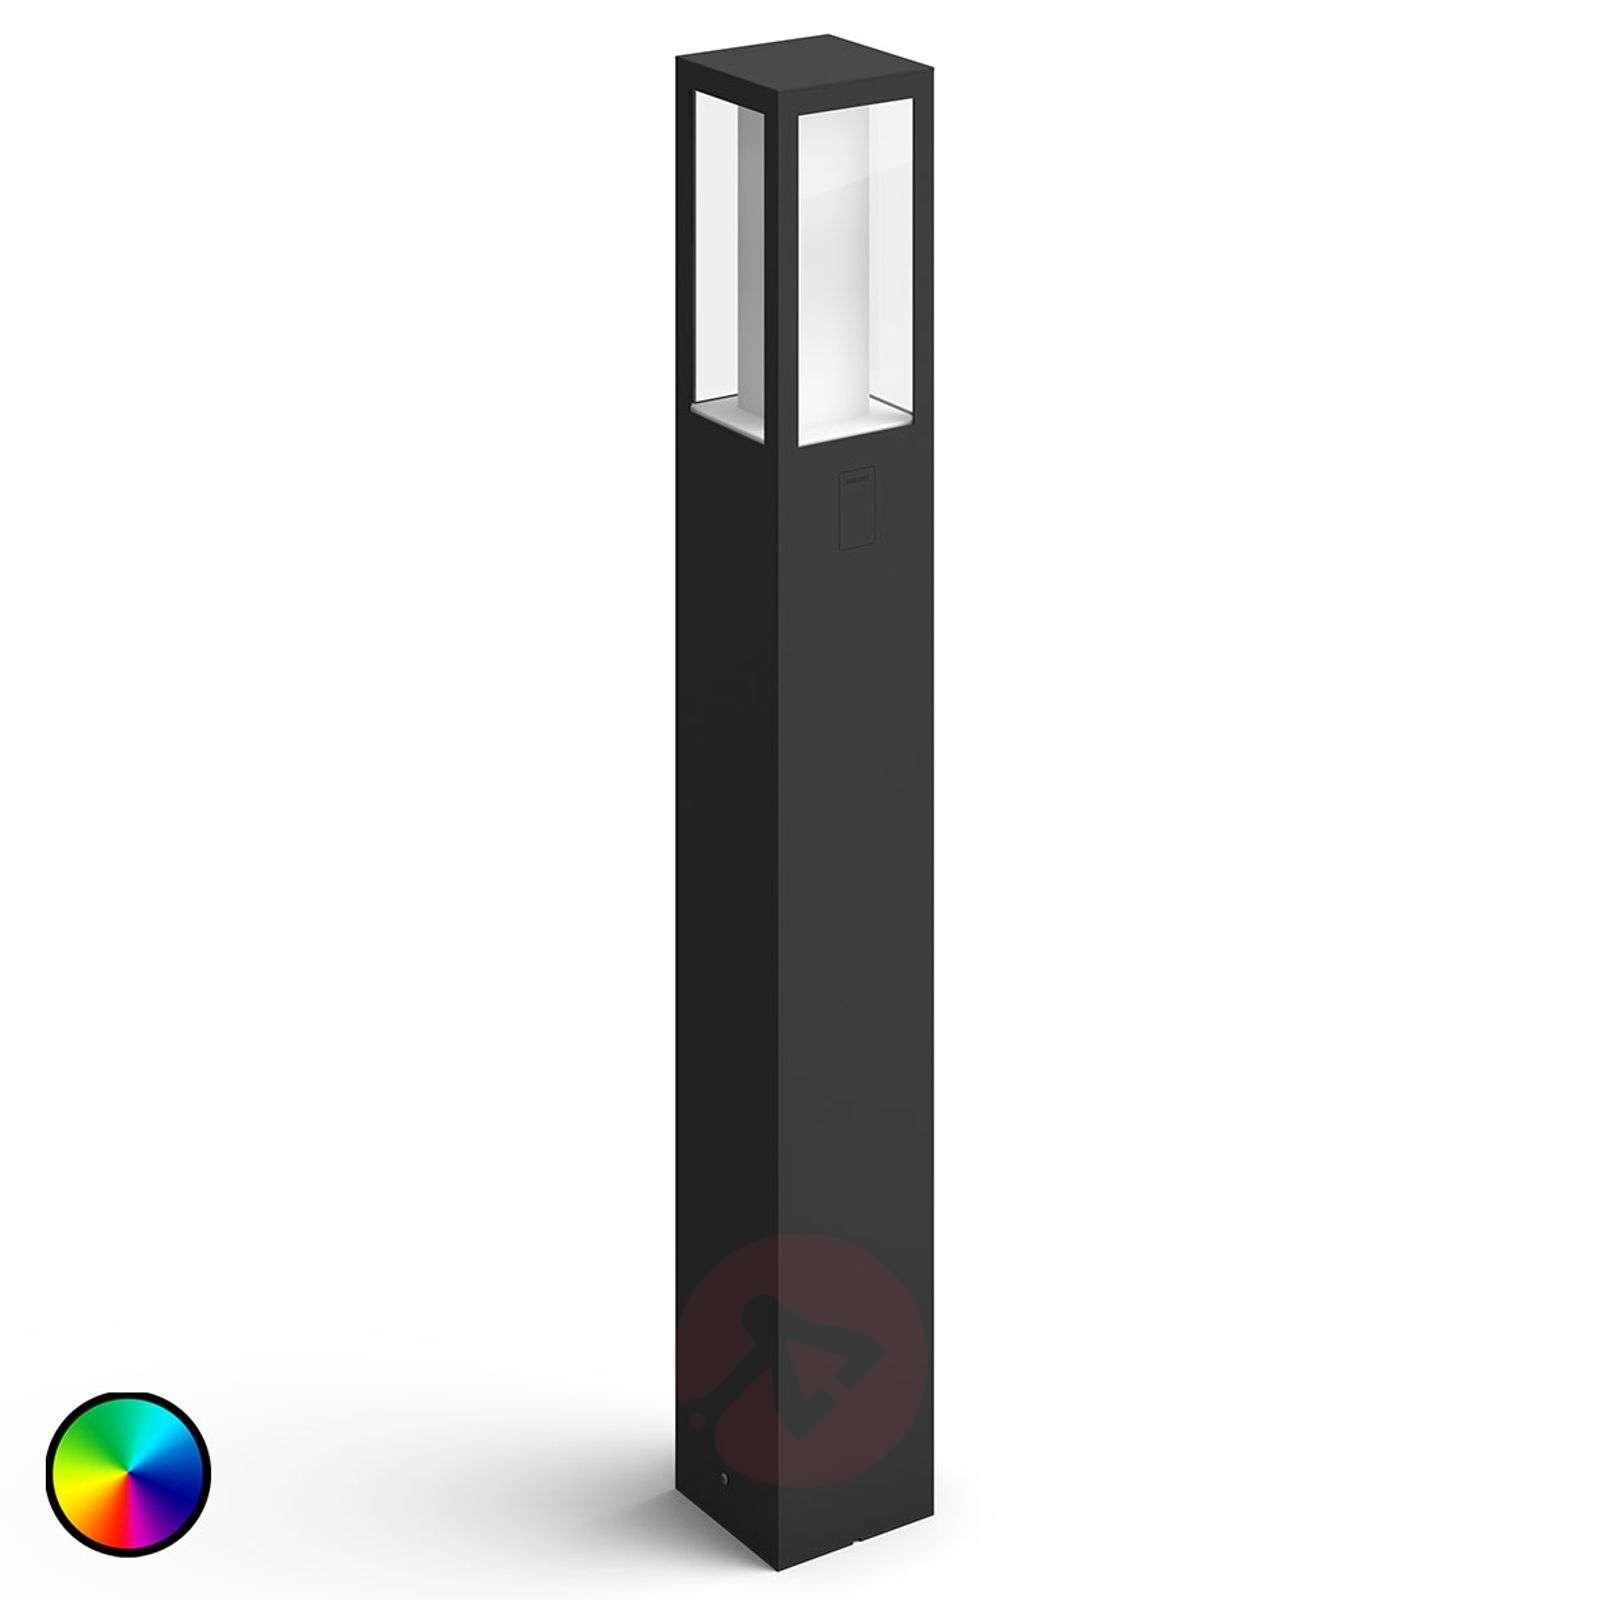 Philips Hue White+Color Impress LED path light-7534113-02